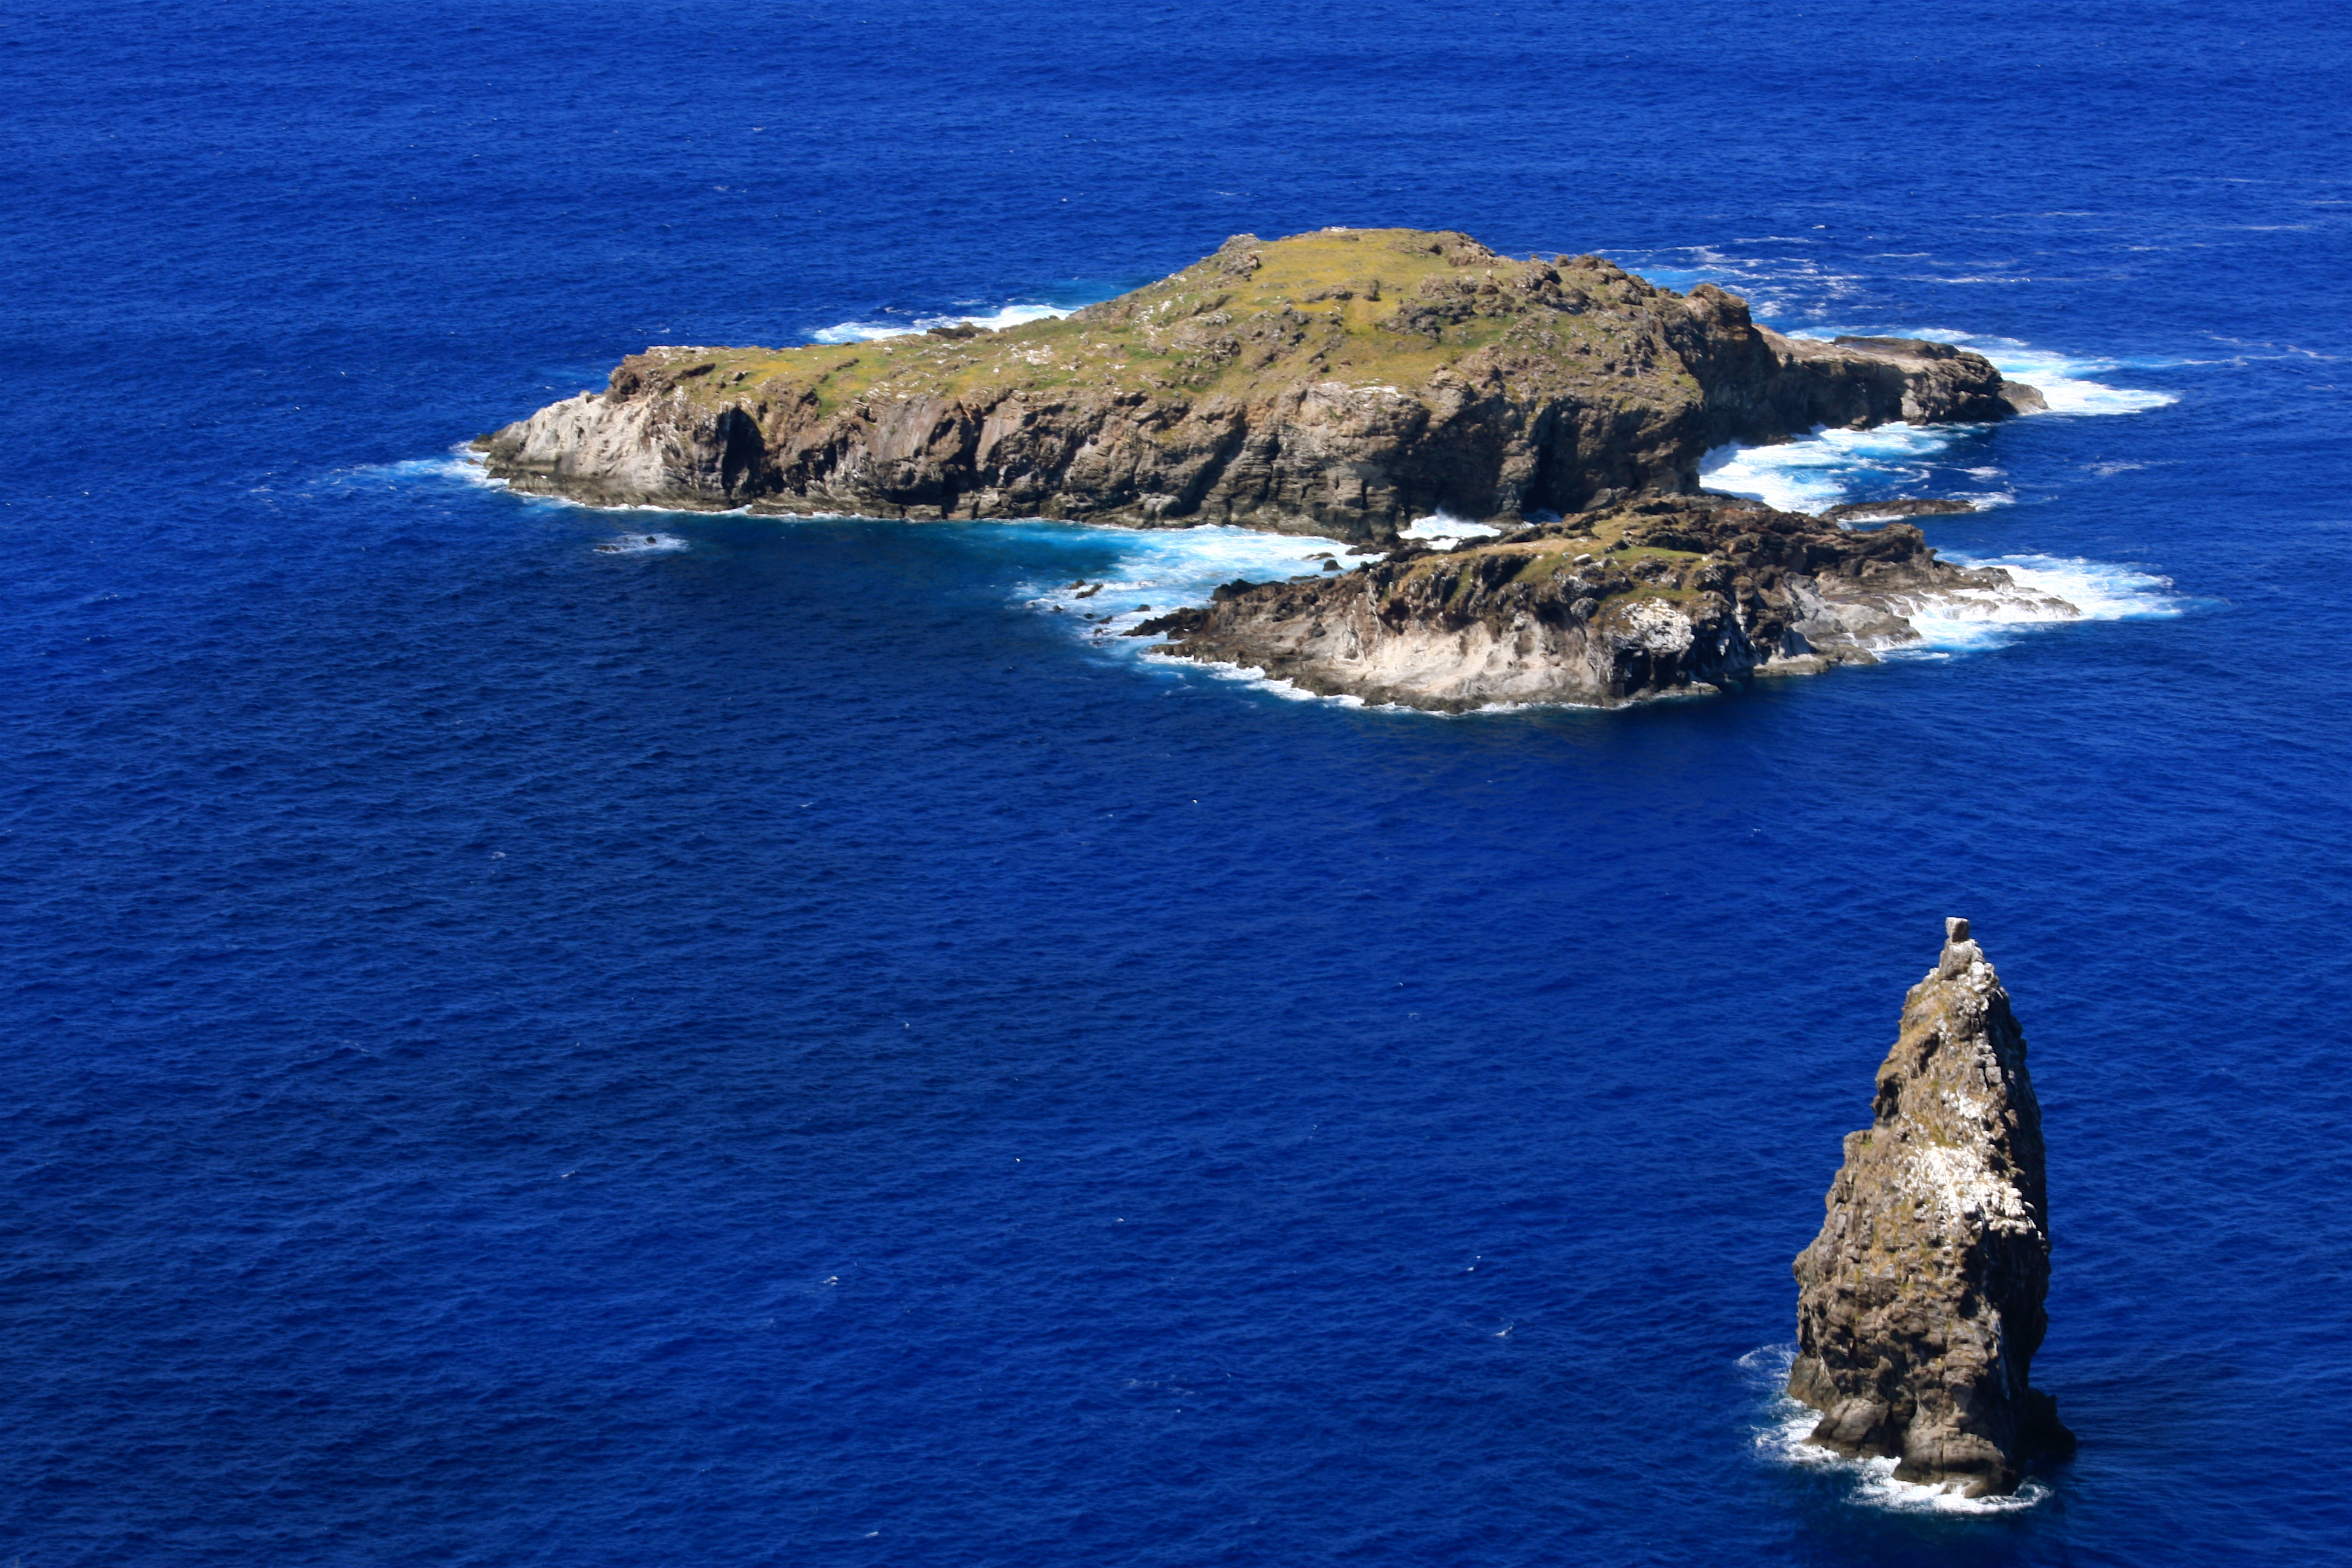 Http Commons Wikimedia Org Wiki File Motu Nui Islet Easter Island 5956399066 Jpg